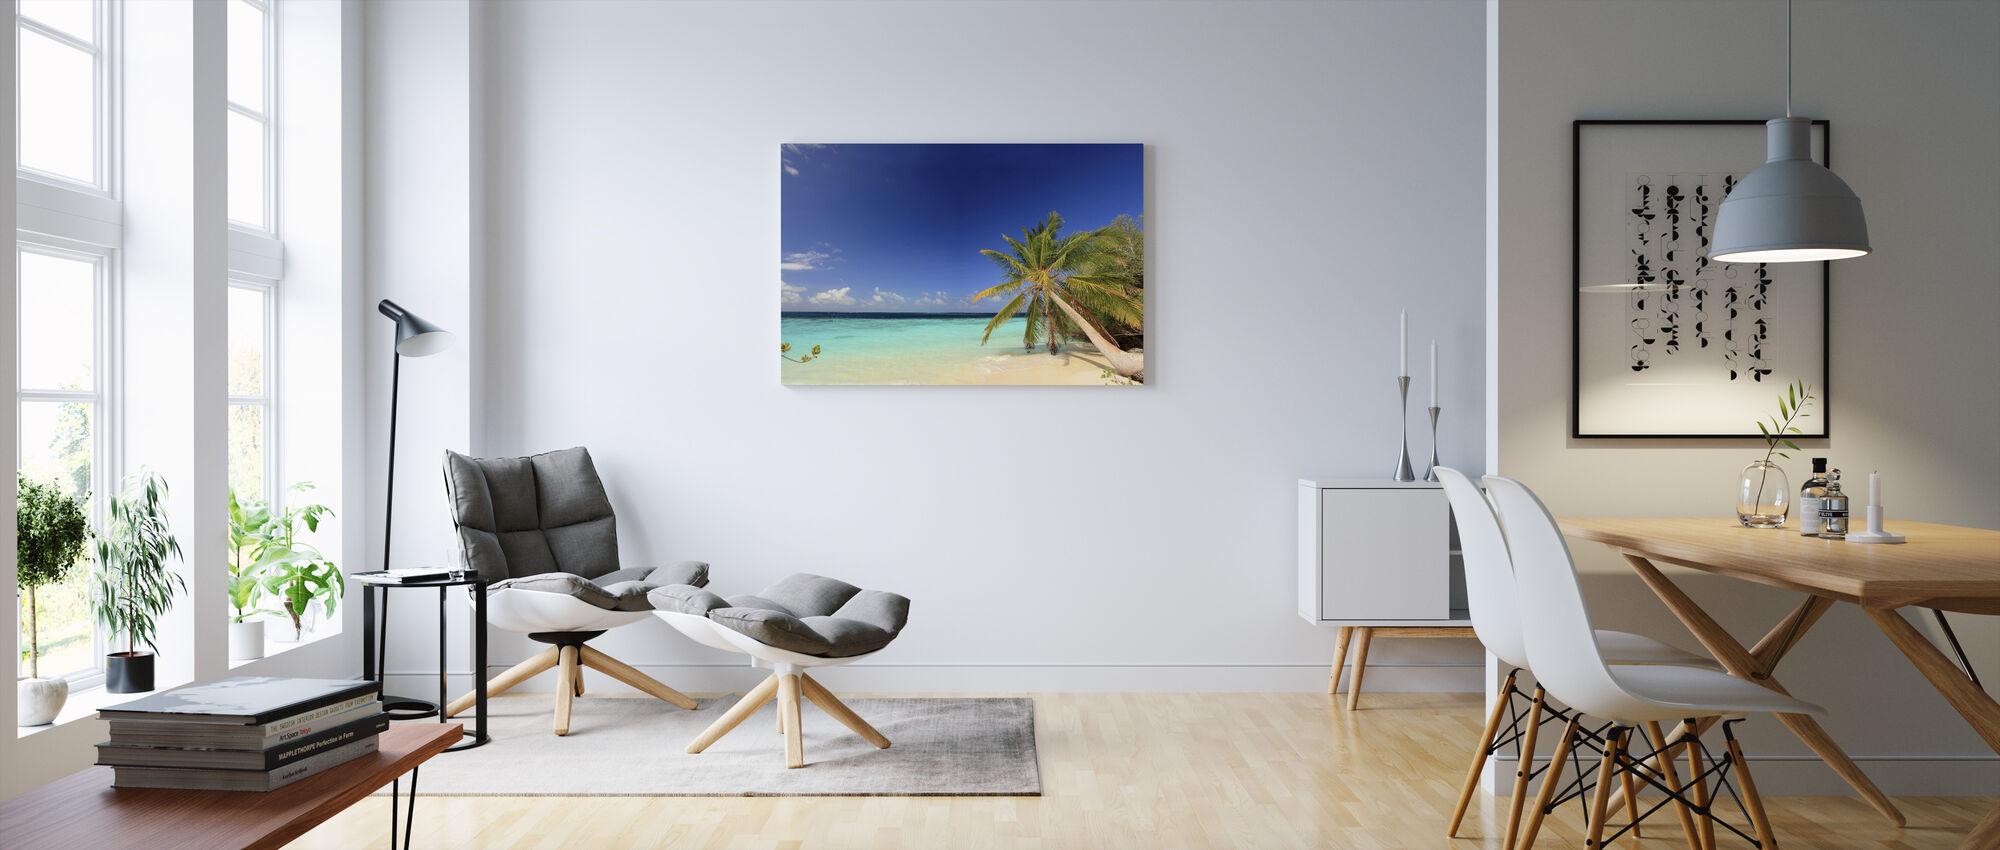 Beach Harmony - Canvas print - Living Room